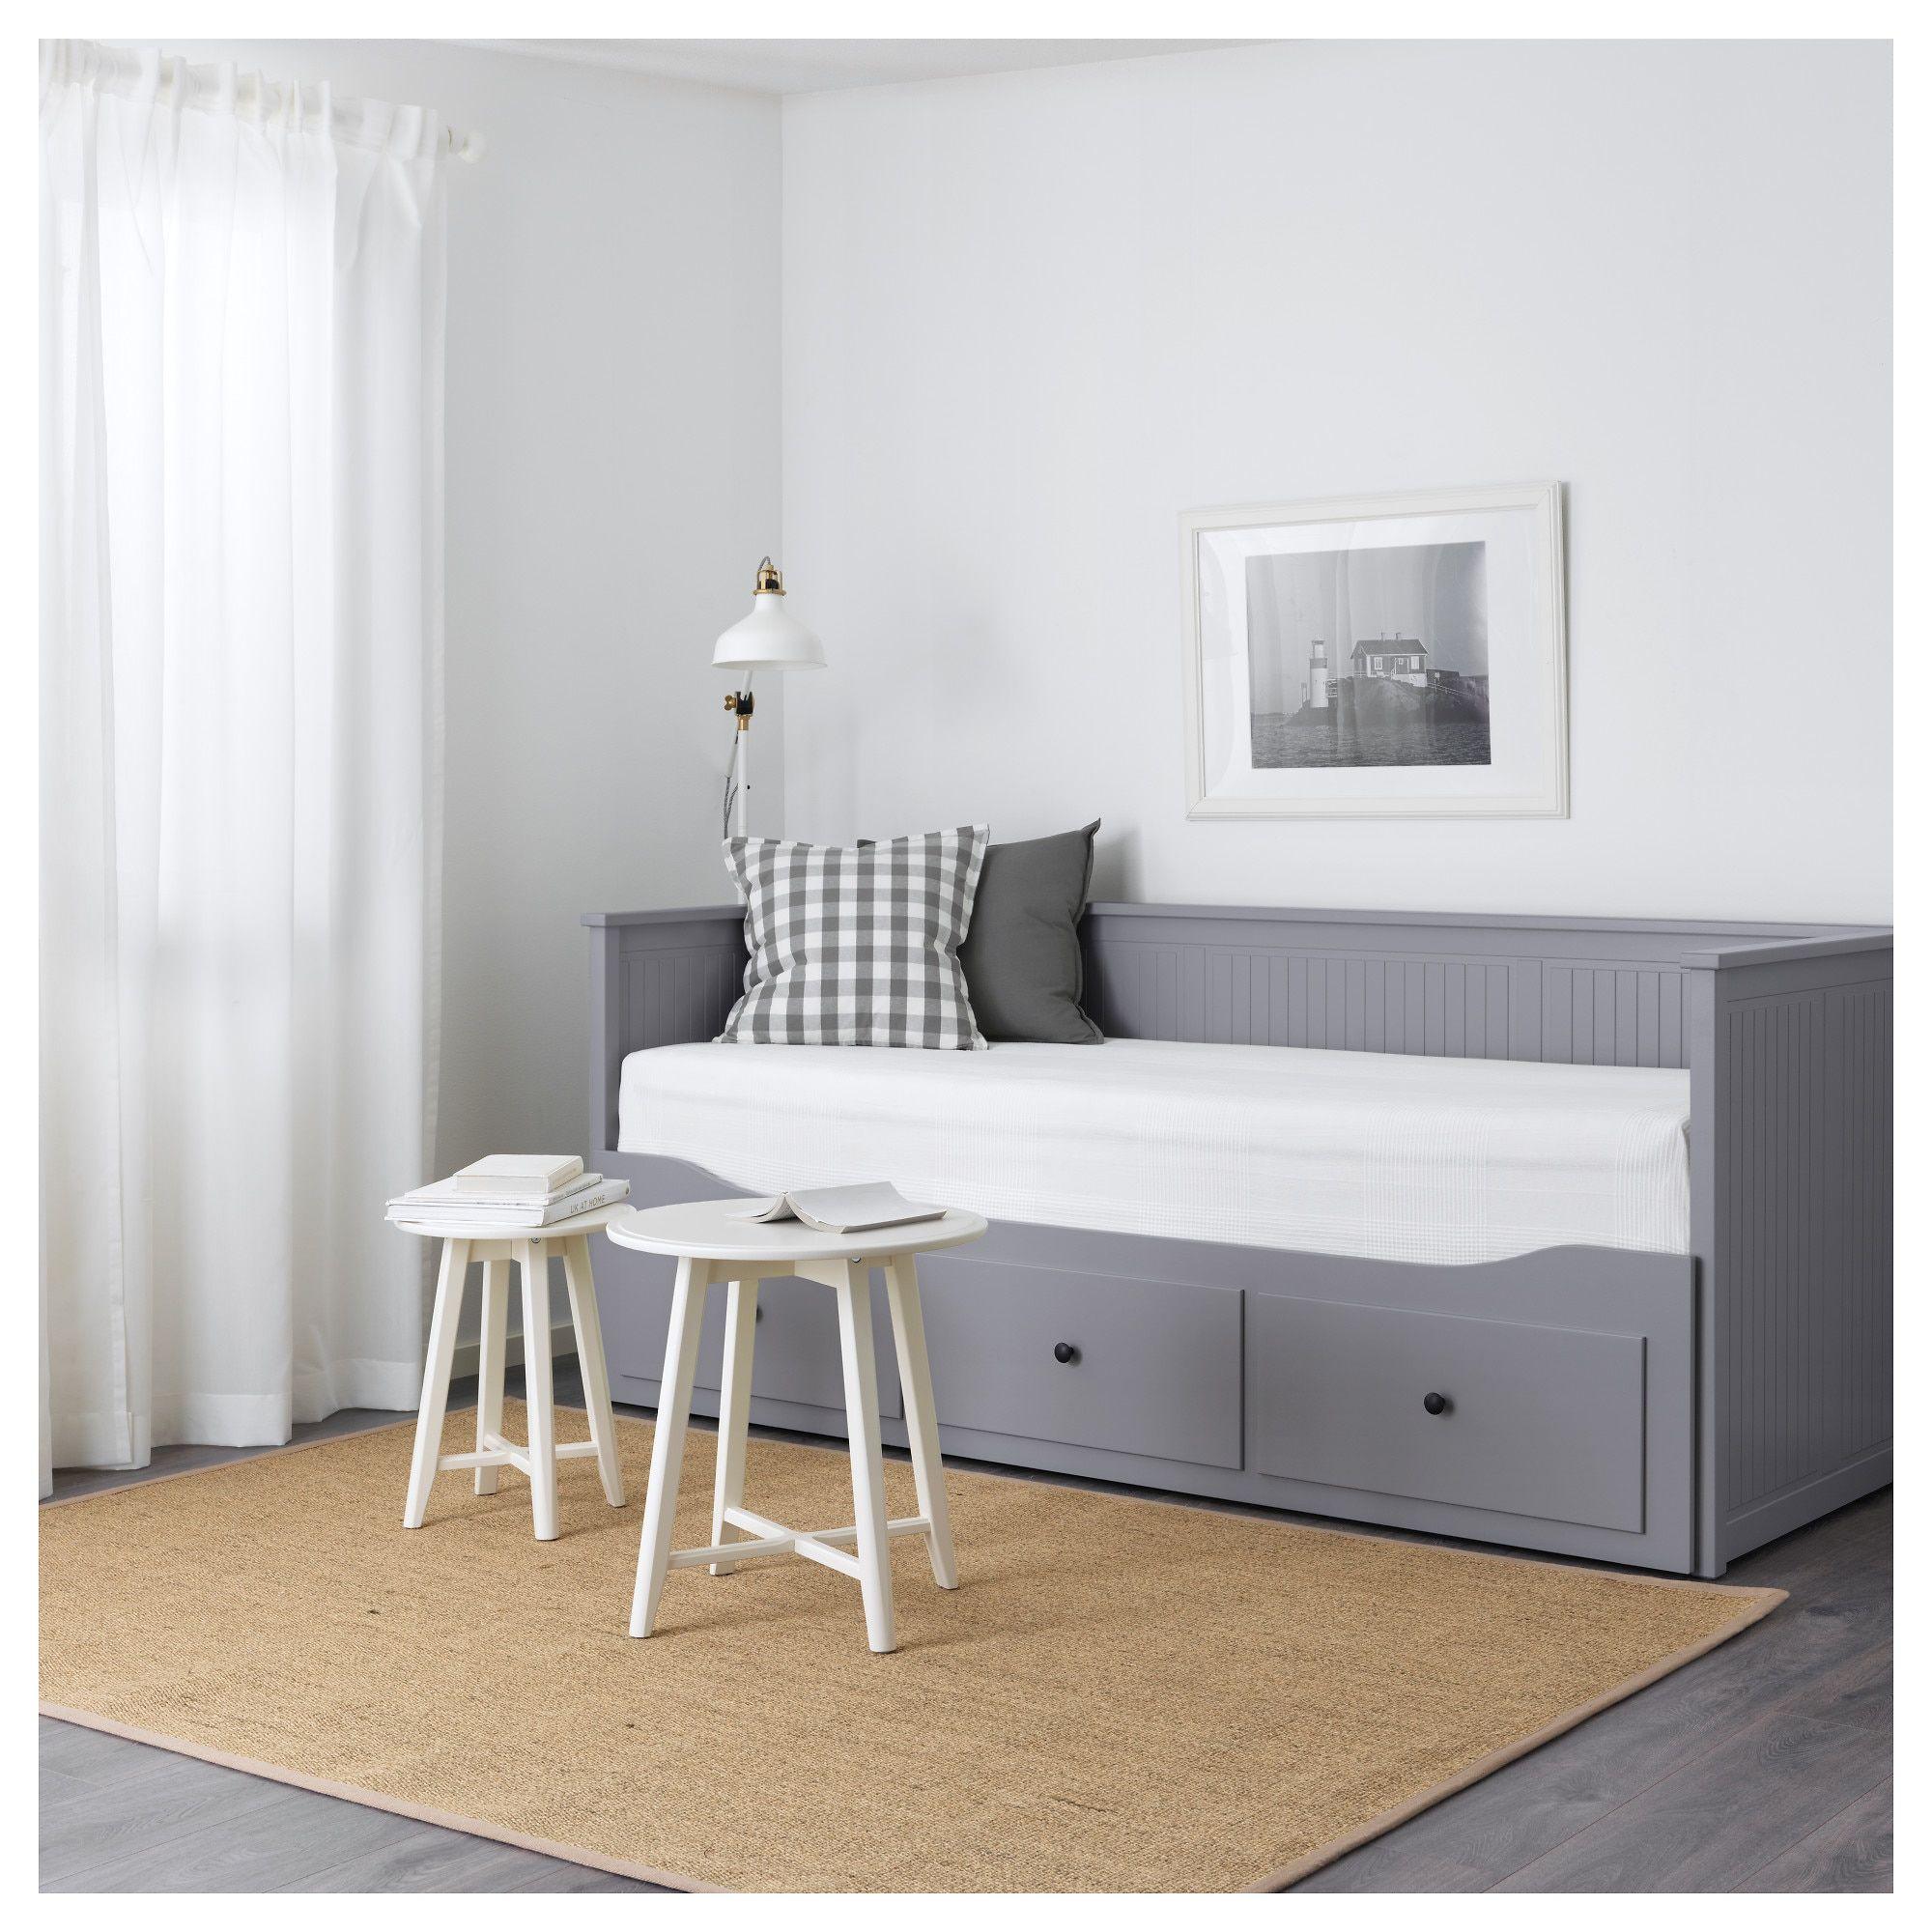 Hemnes Tagesbett 3 Schubladen 2 Matratzen Grau Malfors Fest Bettgestell Bett Mobel Und Ikea Tagesbett